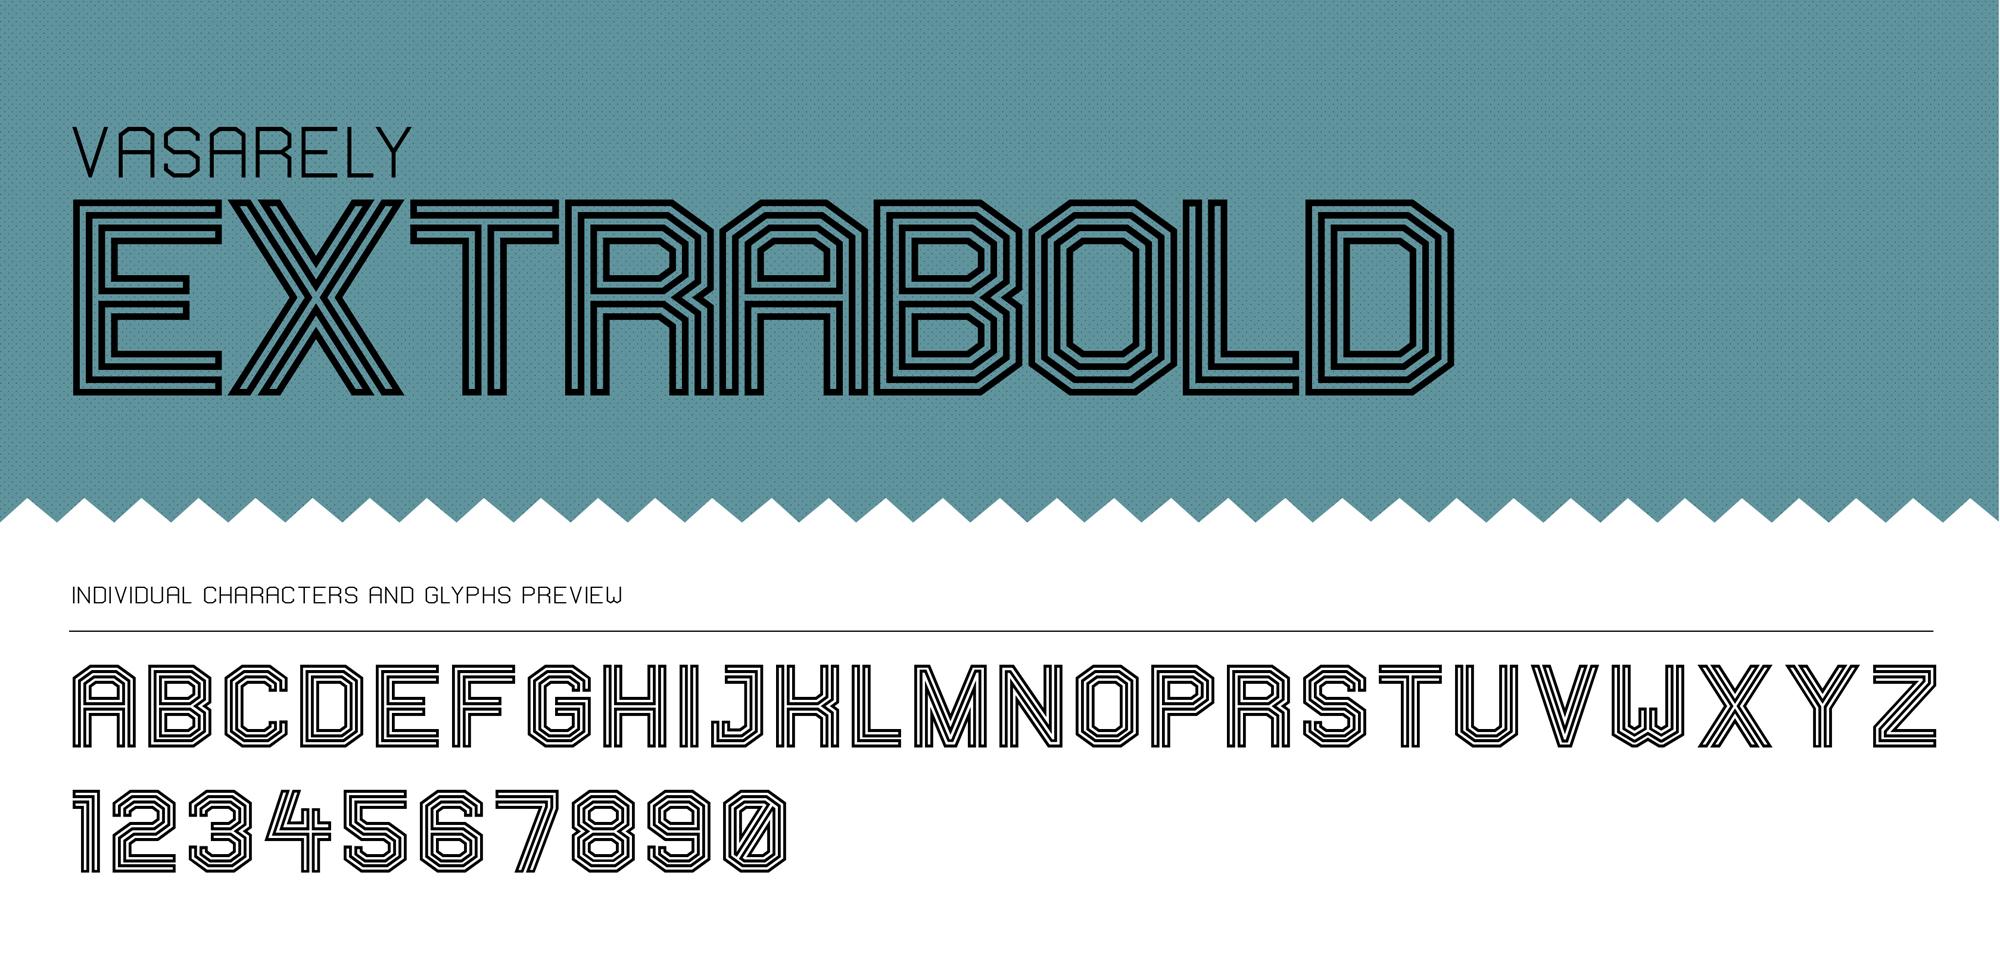 Vasarely presentation - extrabold